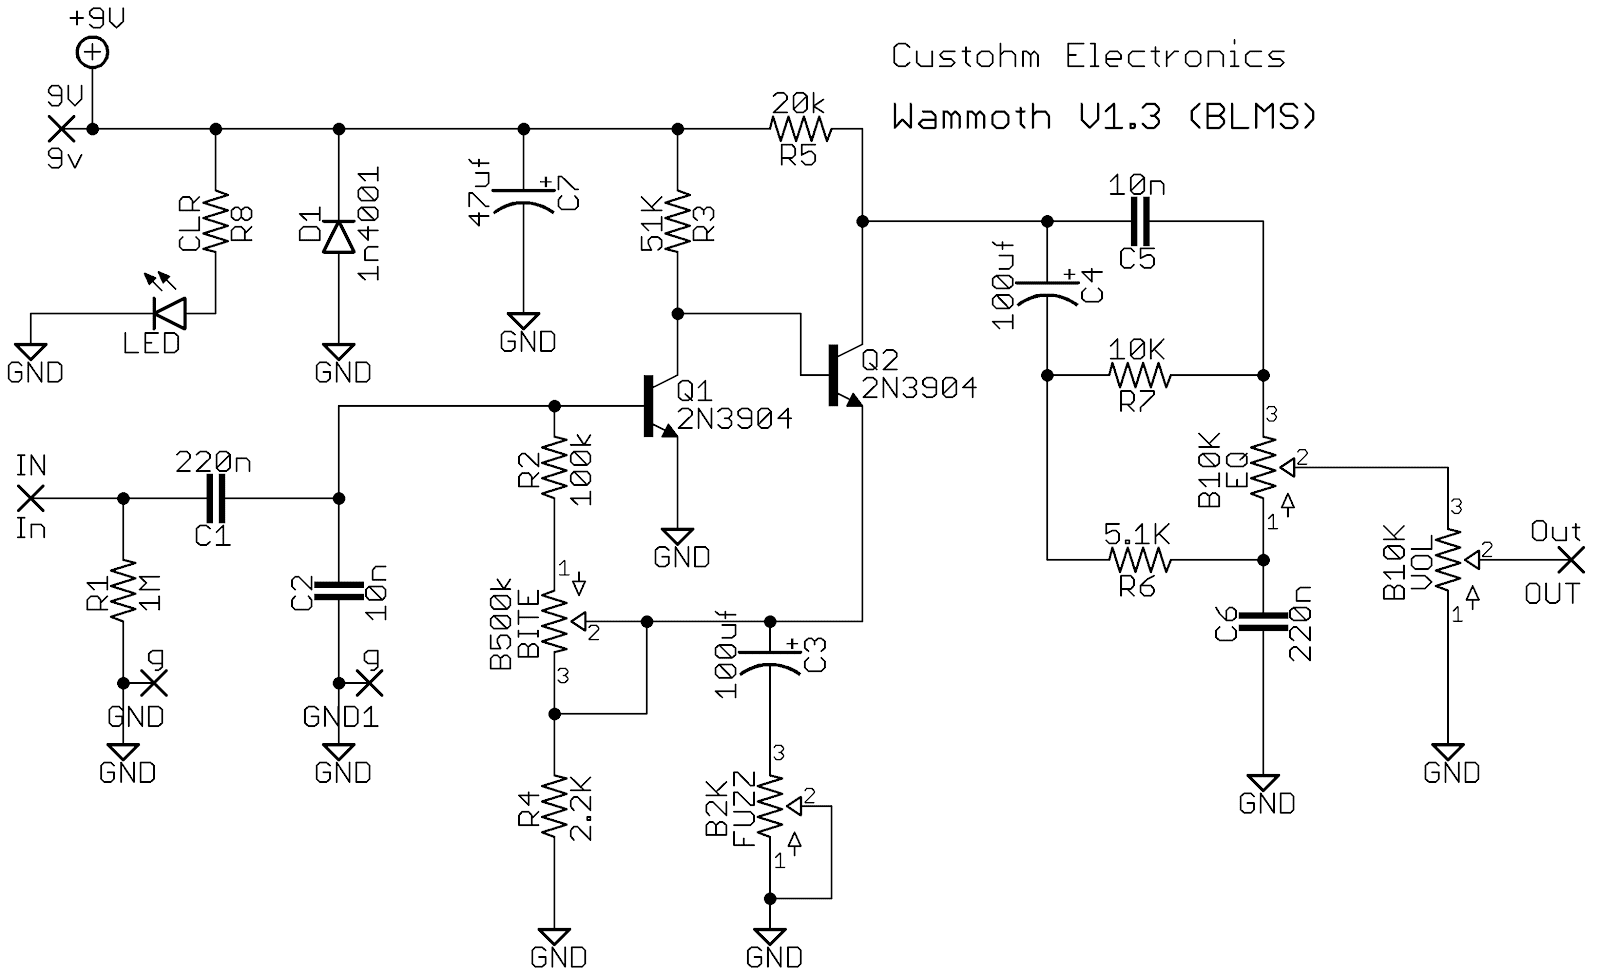 Mammoth Wiring Diagram   Wiring Diagram on